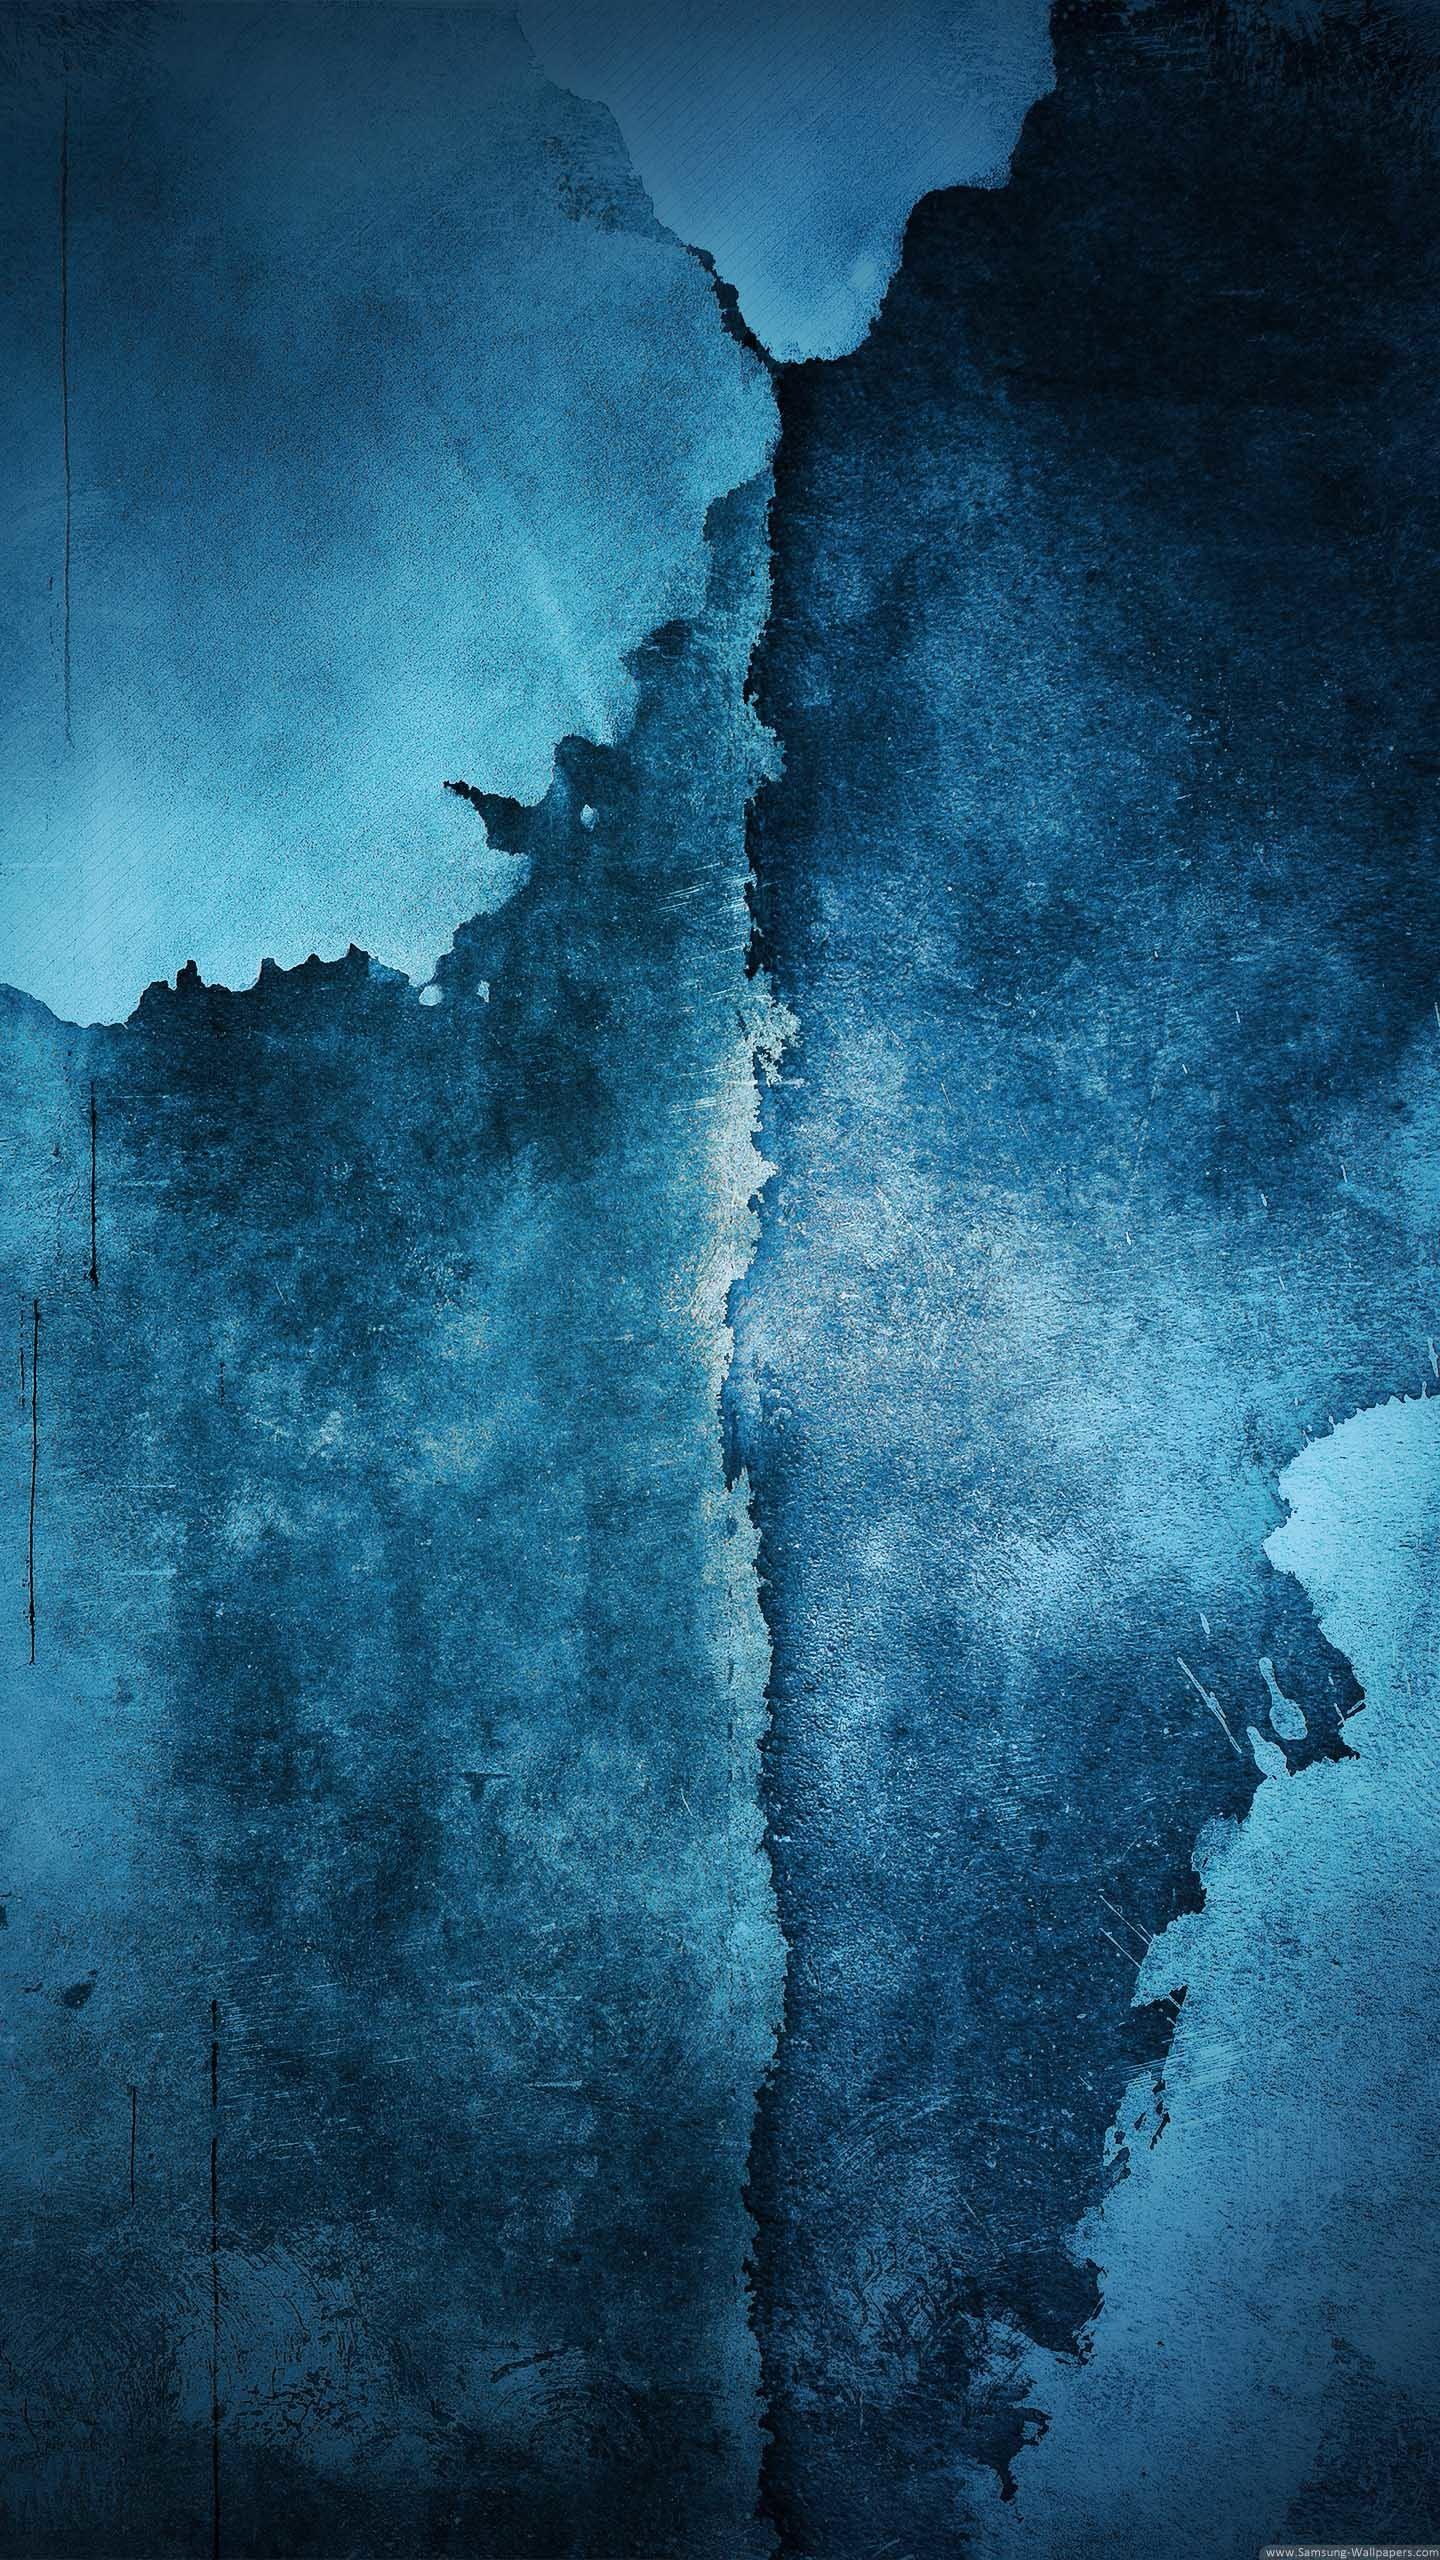 Blue Abstract Lock Screen Samsung Galaxy S5 Wallpaper Fortis Fortuna Adiuvat Phone 1440x2560 Wallpaper Teahub Io